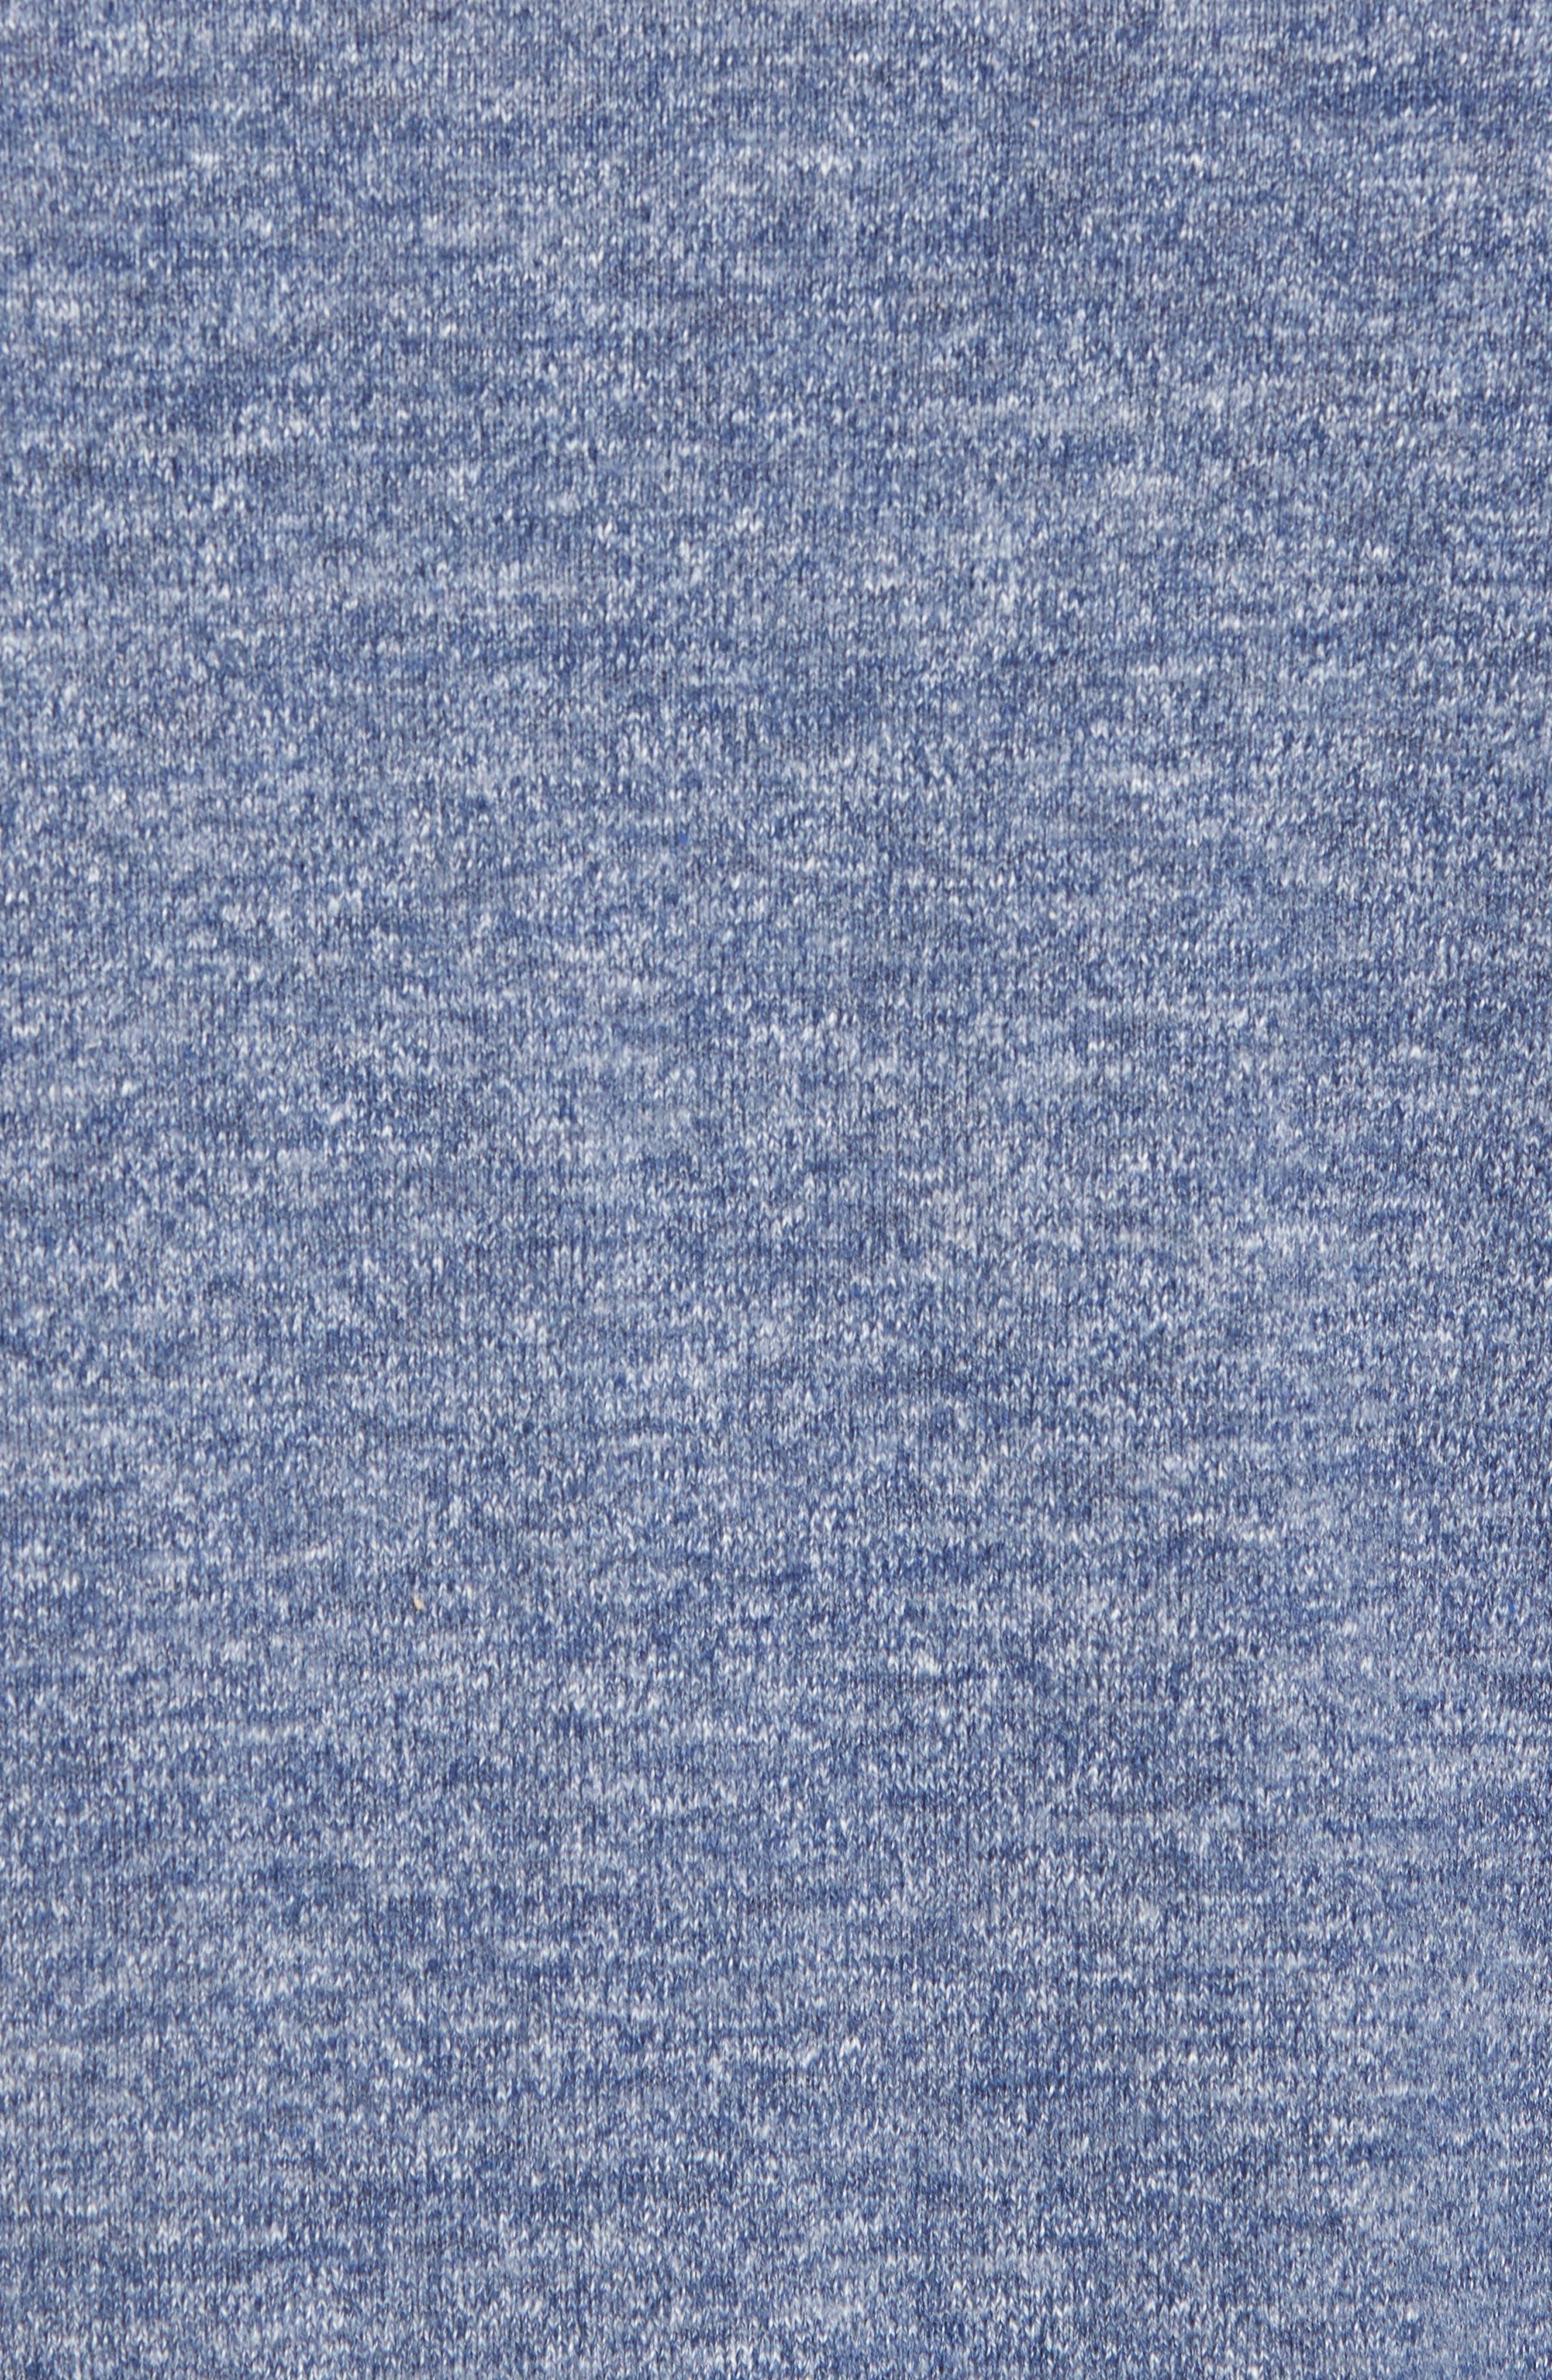 Arbors Cotton V-Neck Sweater,                             Alternate thumbnail 14, color,